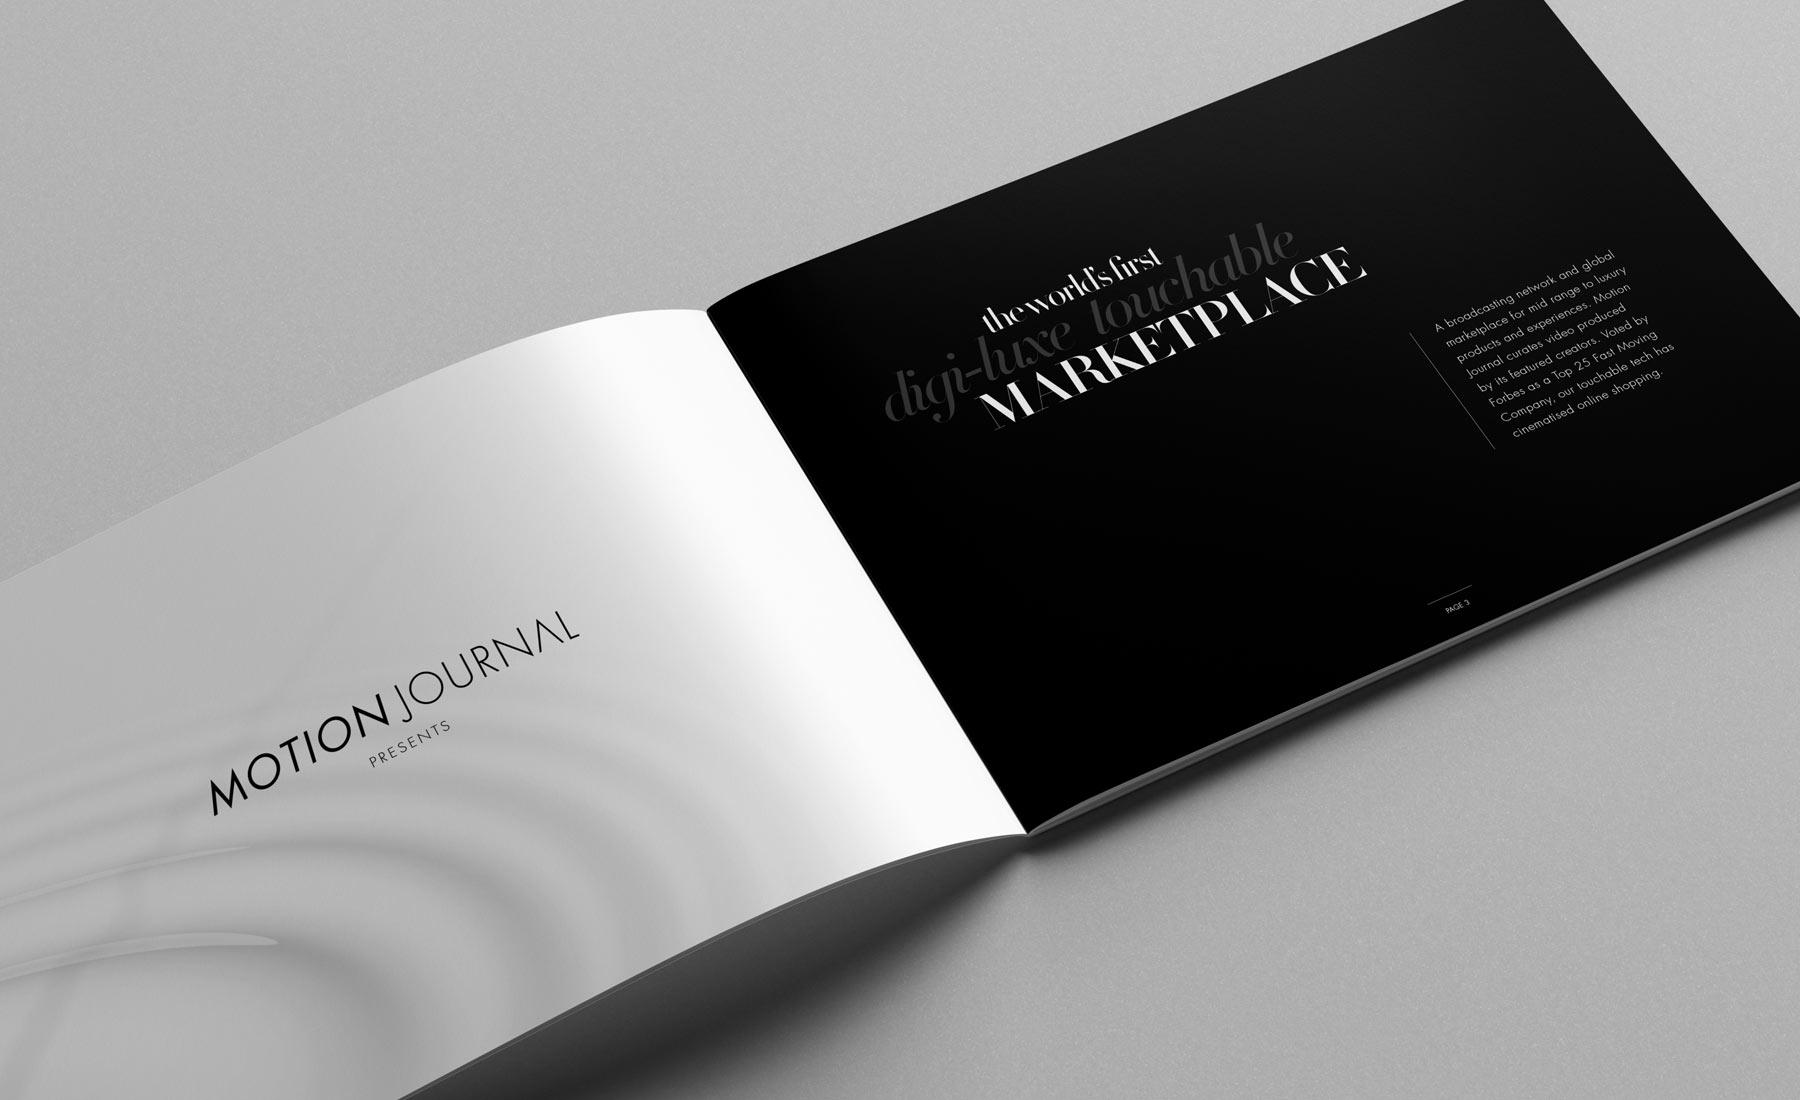 Motion Journal Press Kit Bvn Creative